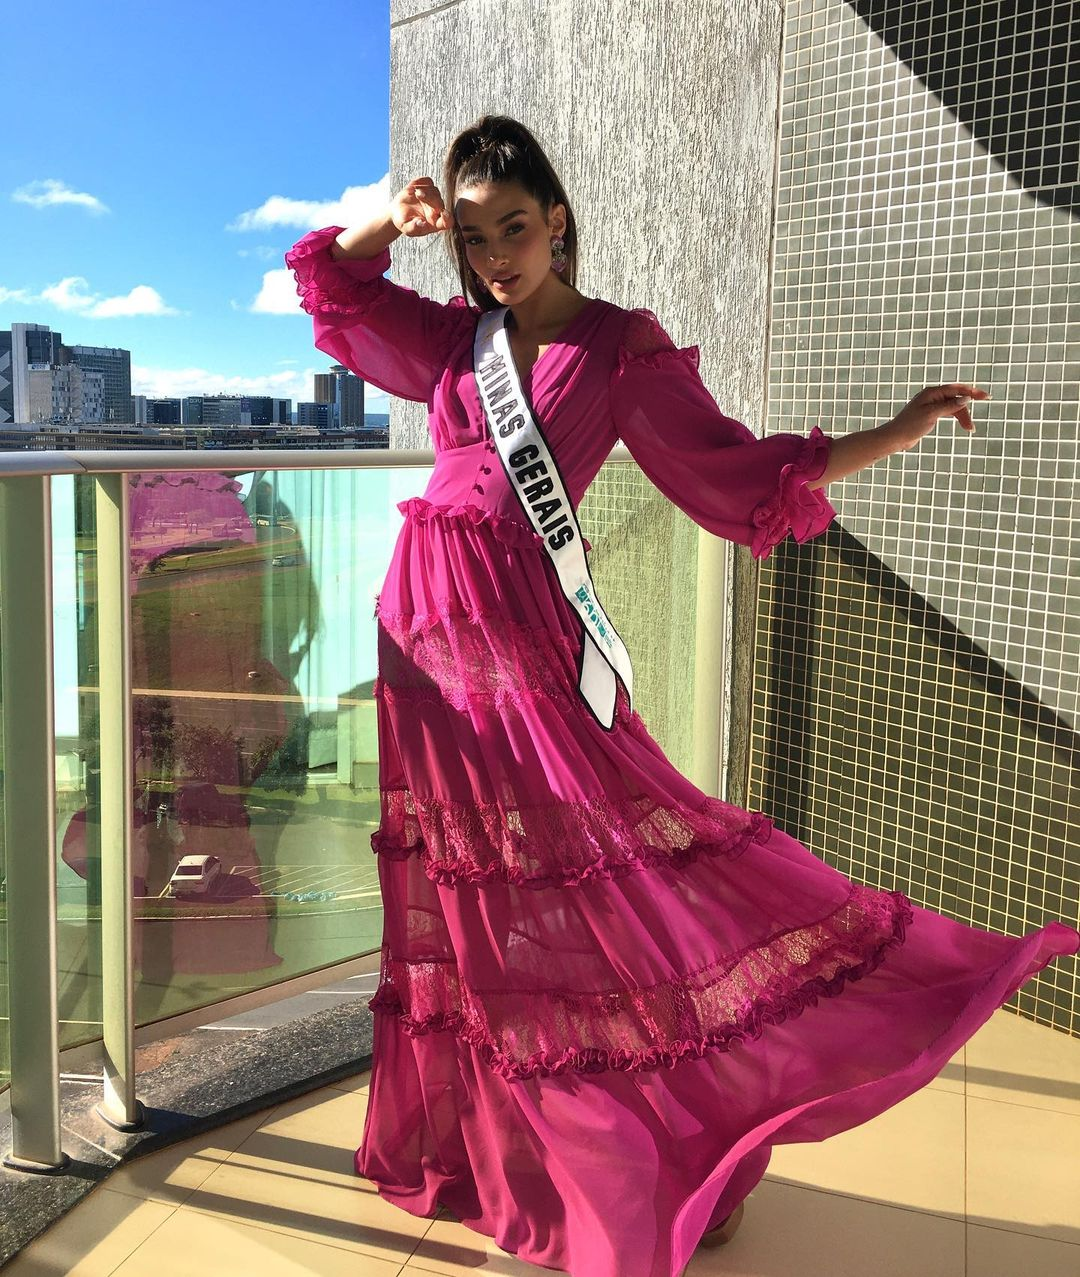 luma russo, top 3 de miss supranational brazil 2020. - Página 3 Russol24